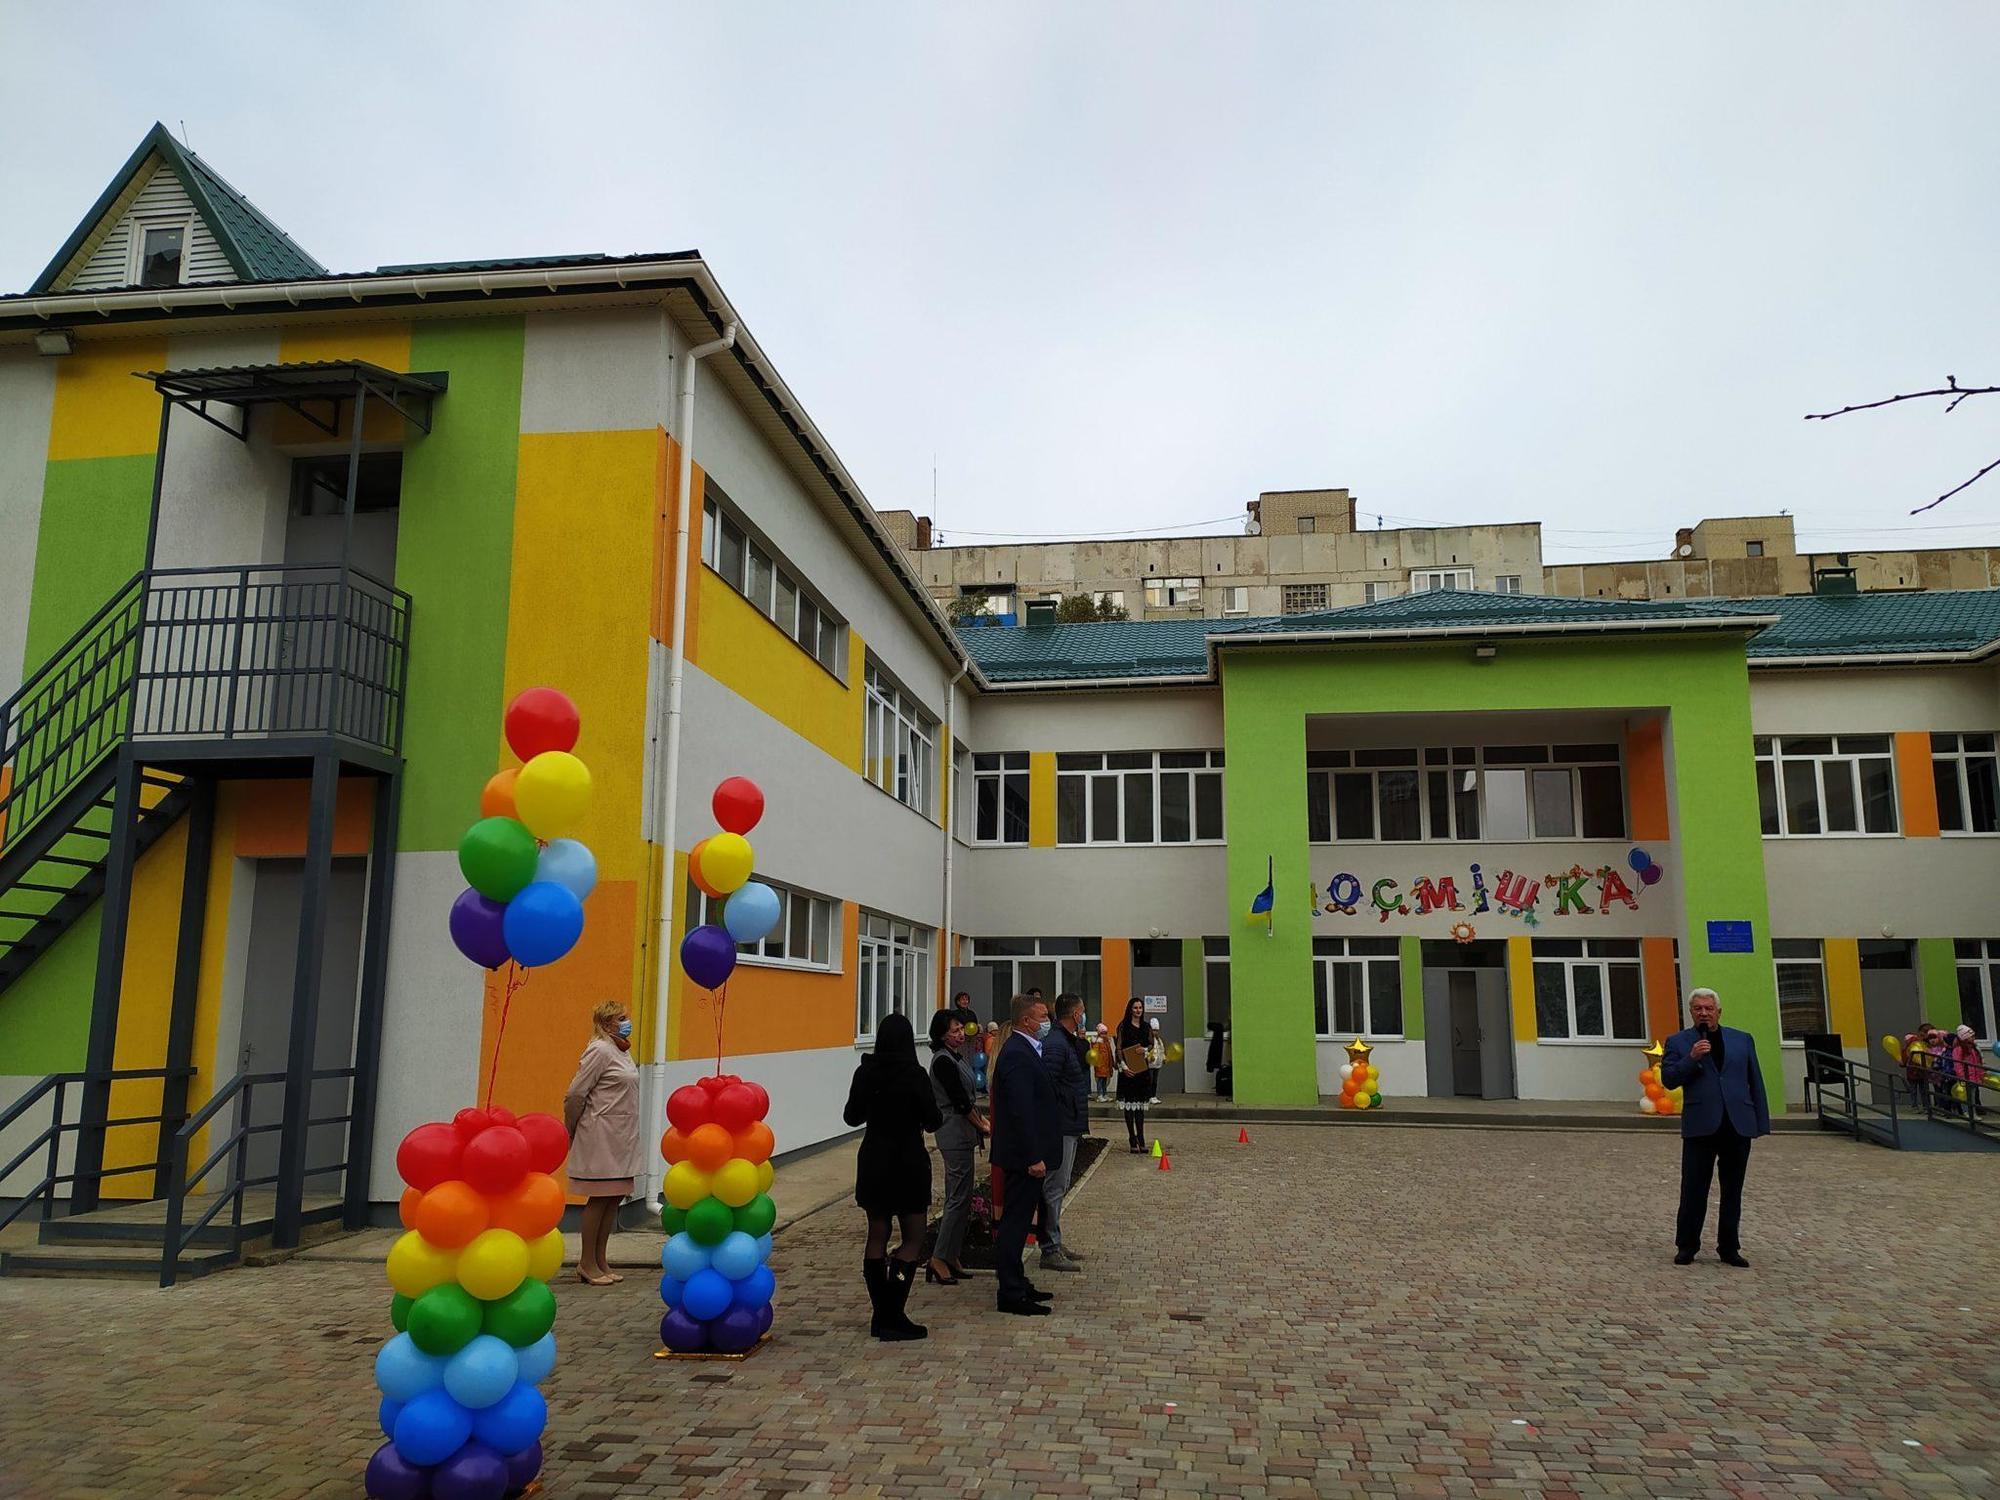 дитячий садок №40 Посмішка Бахмут